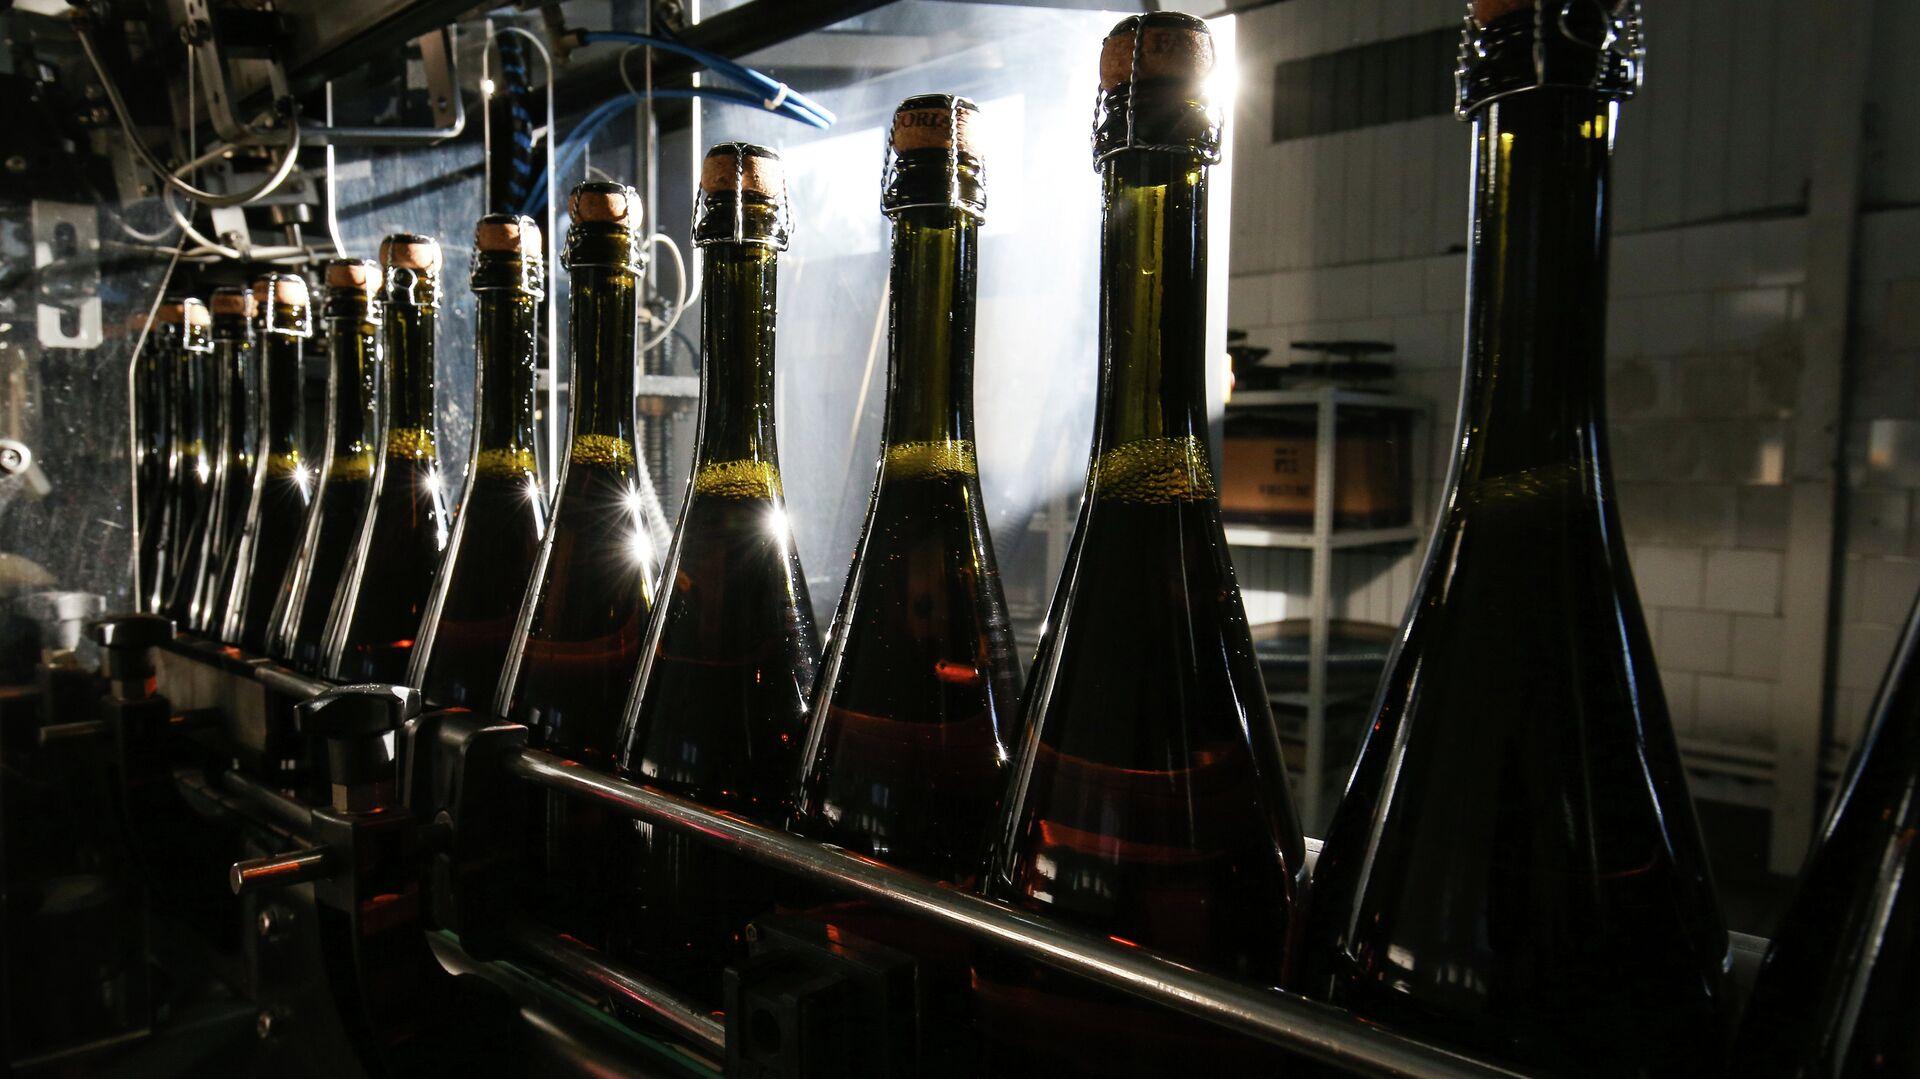 Bottiglie di spumante - Sputnik Italia, 1920, 14.09.2021